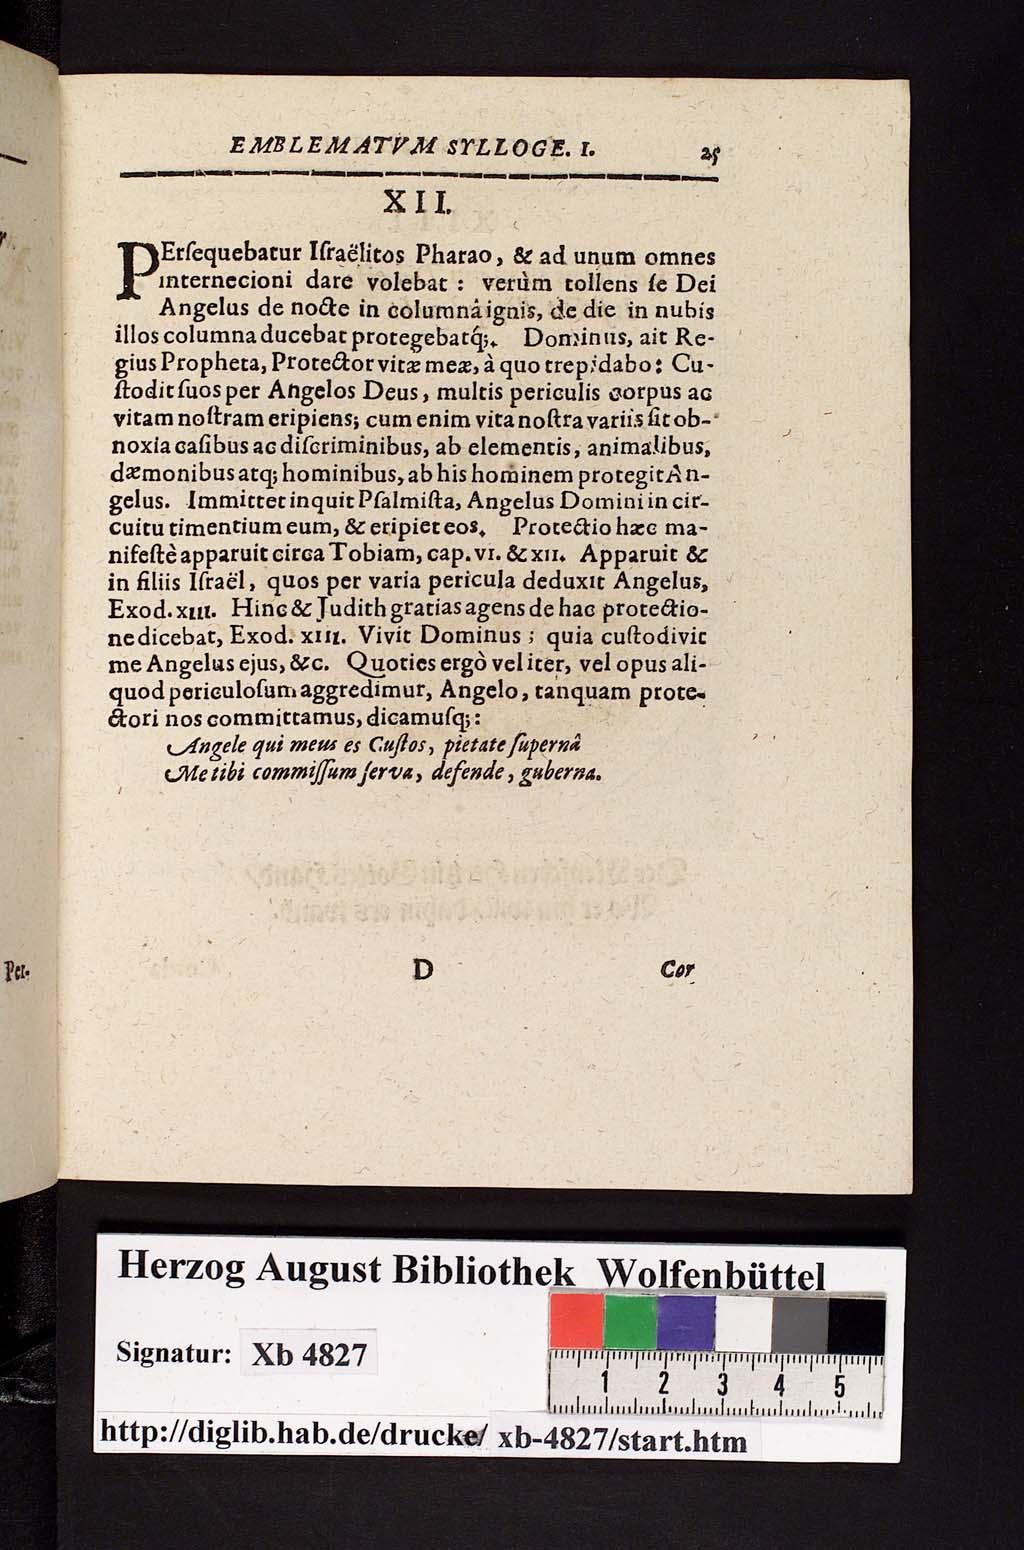 https://diglib.hab.de/drucke/xb-4827/00028.jpg